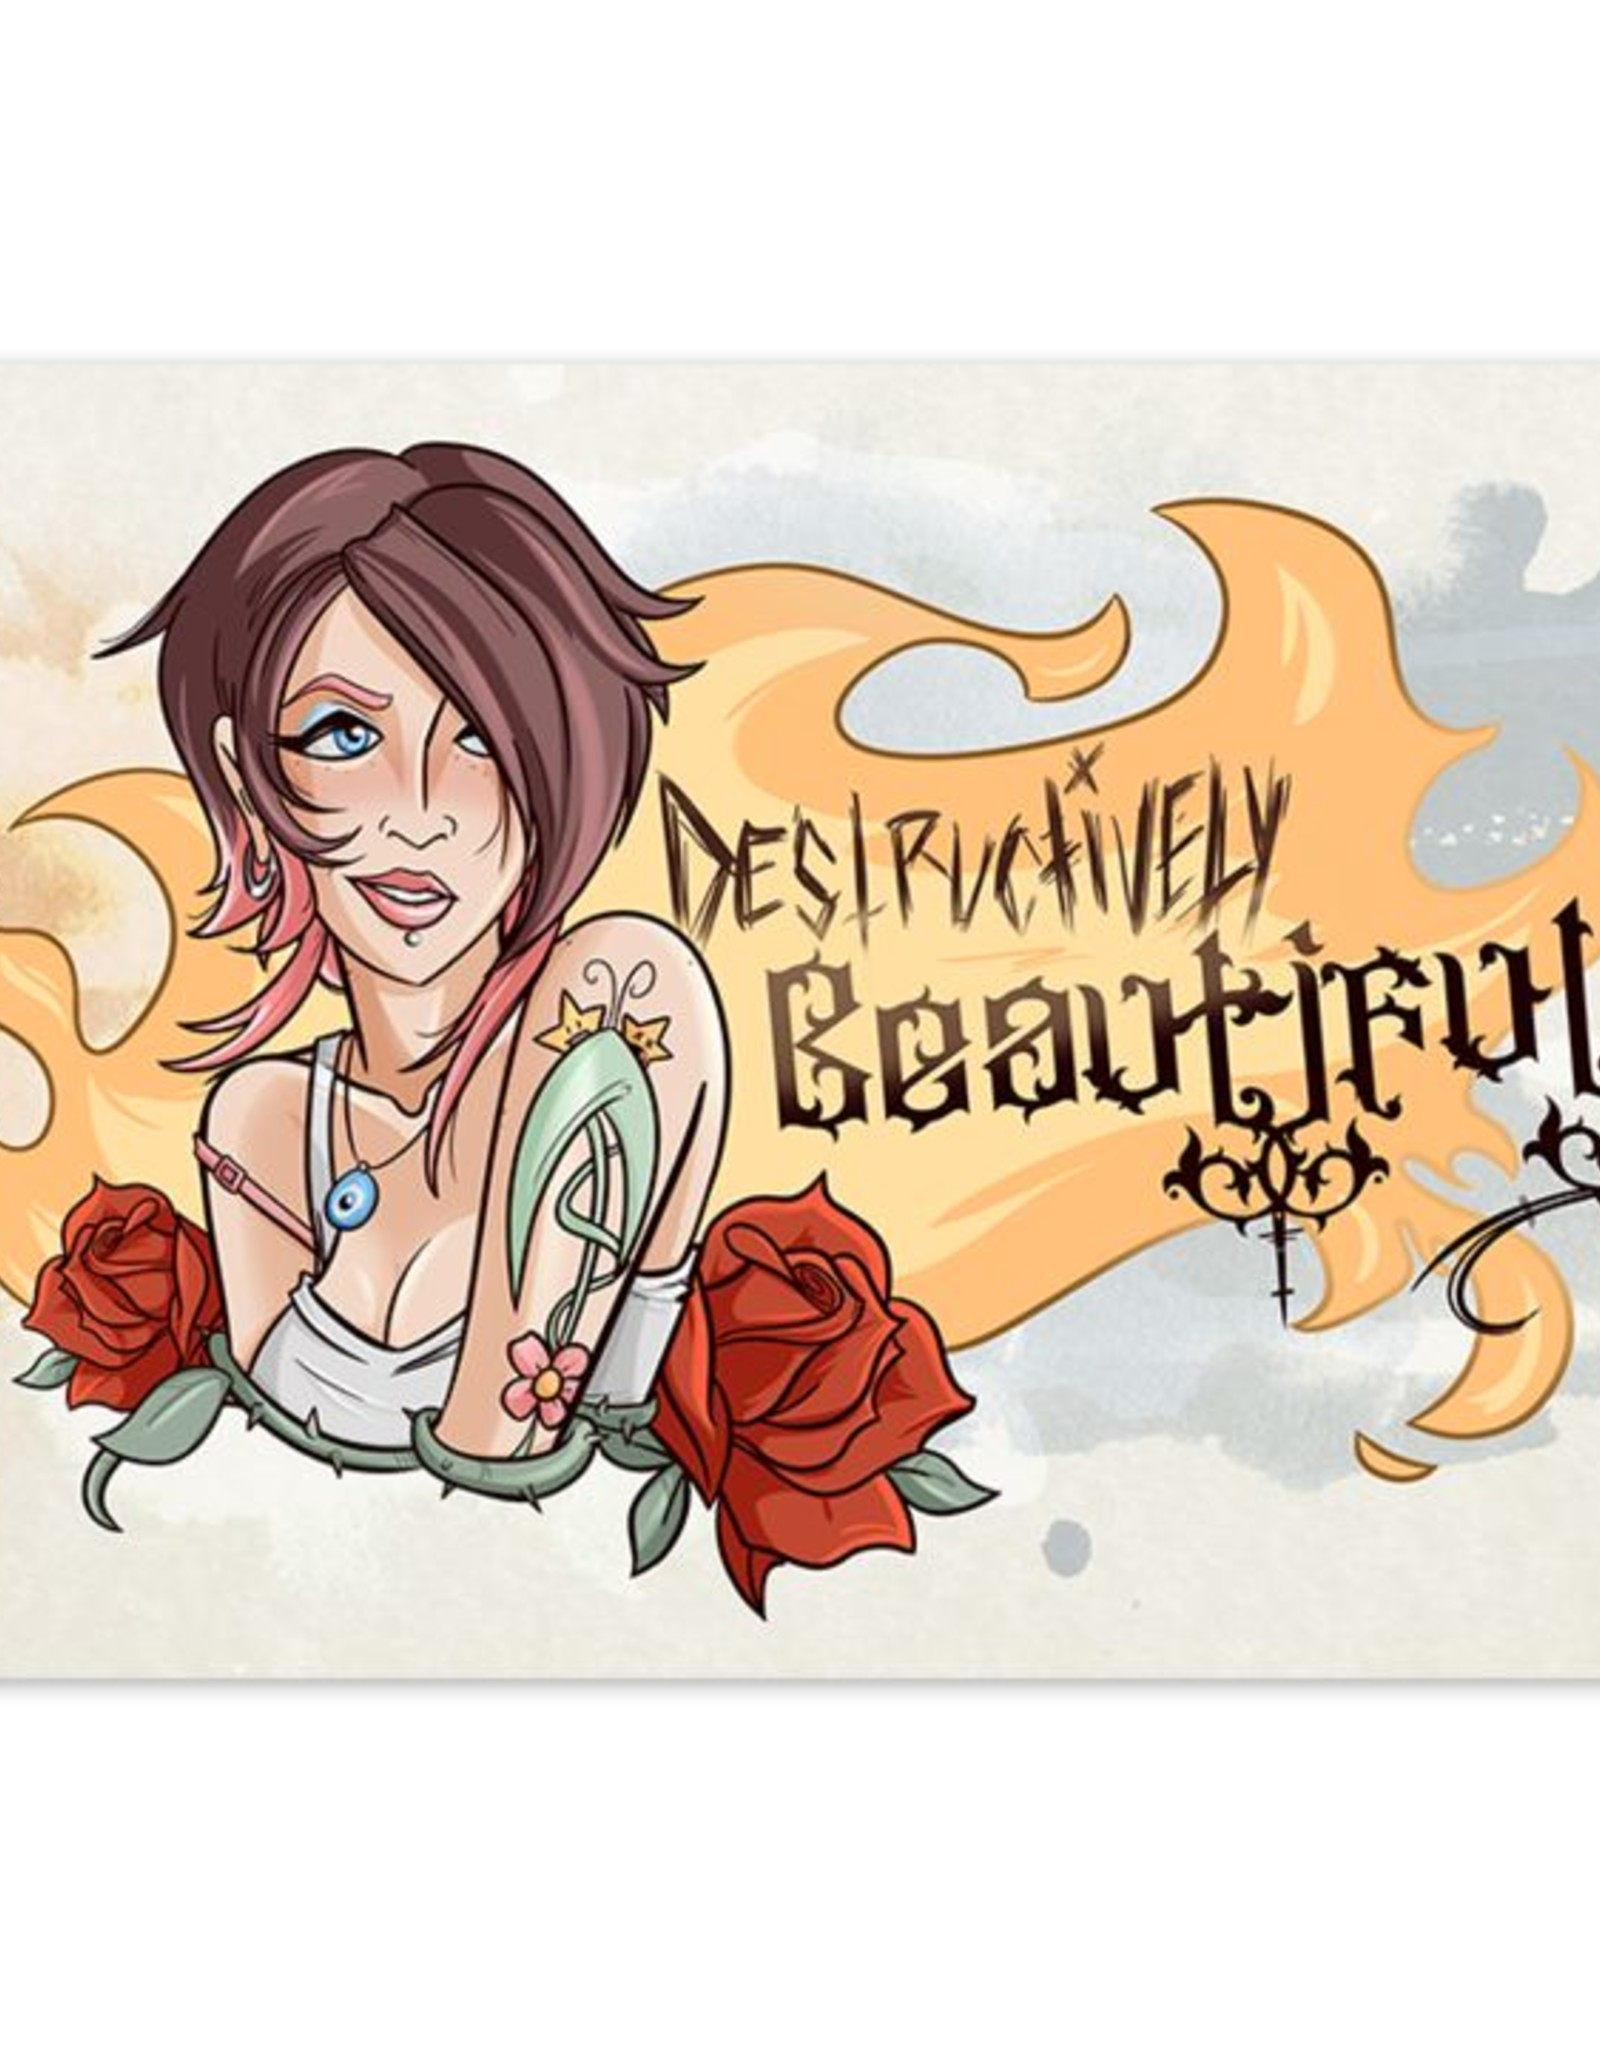 Destructively Beautiful - 8x12 Print